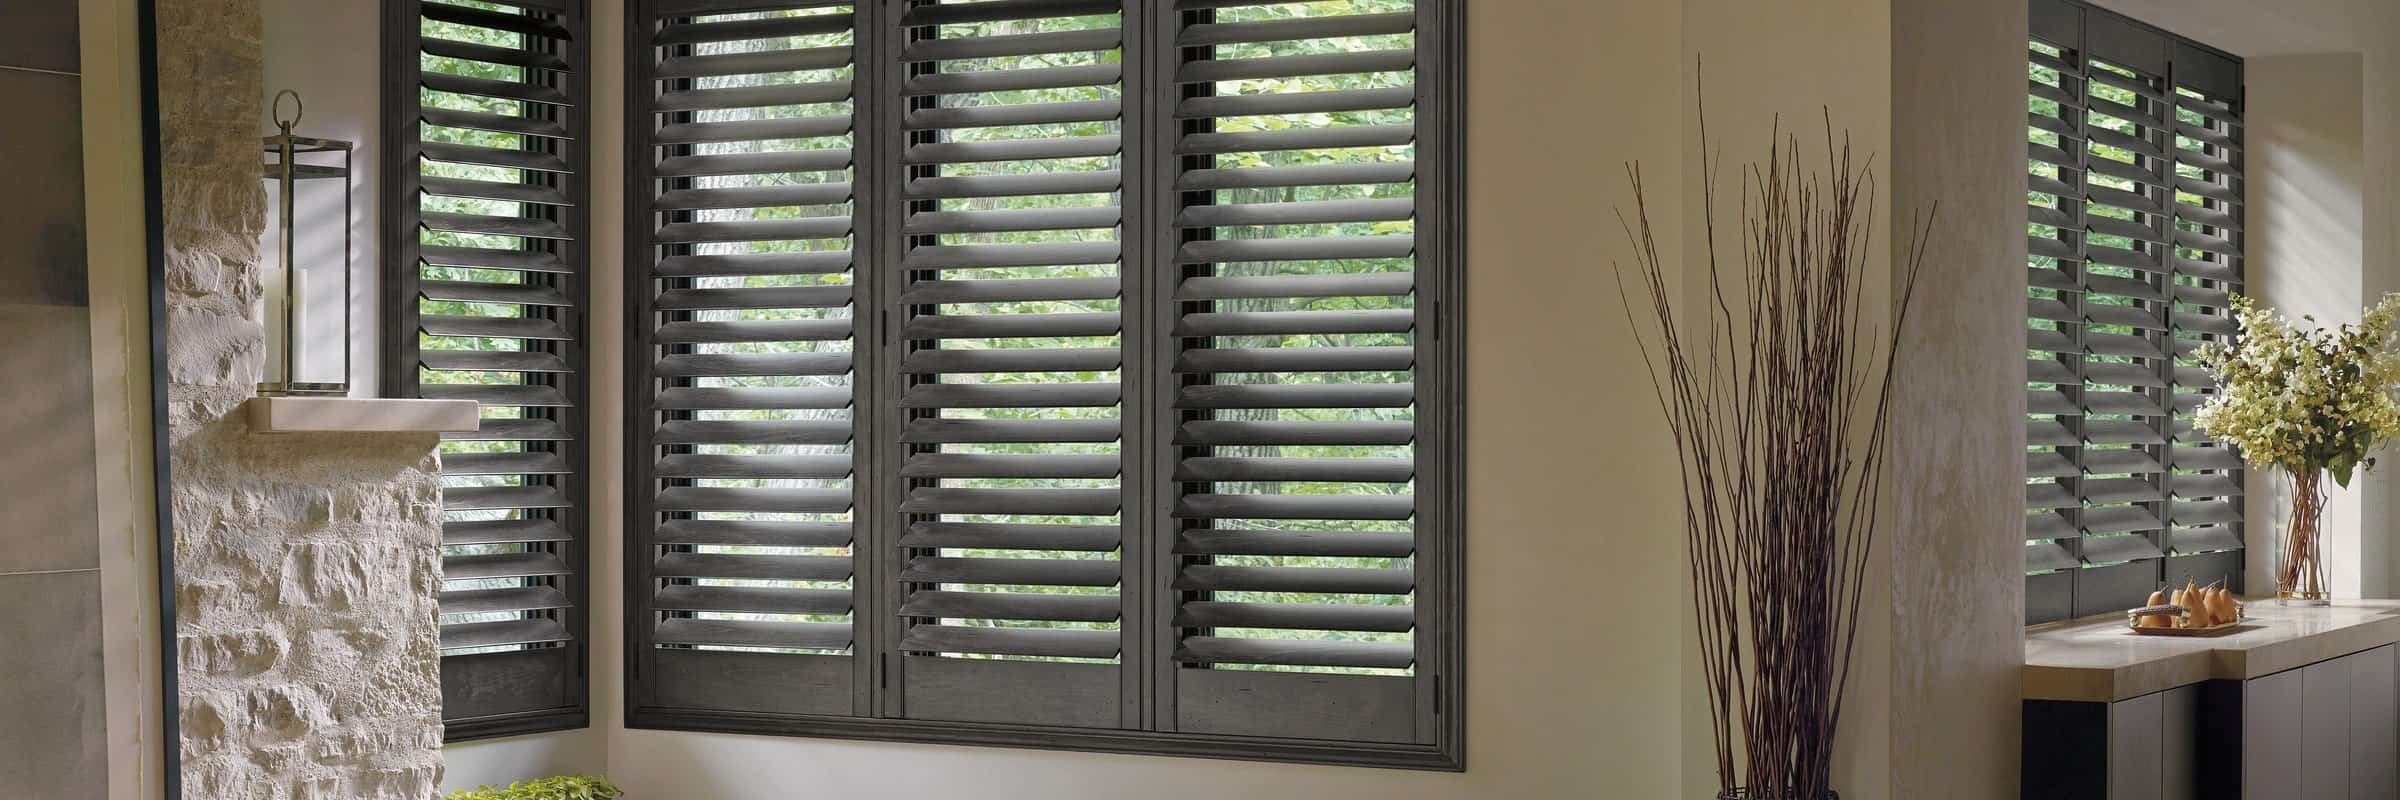 wooden-shutters-heritance-carousel-03